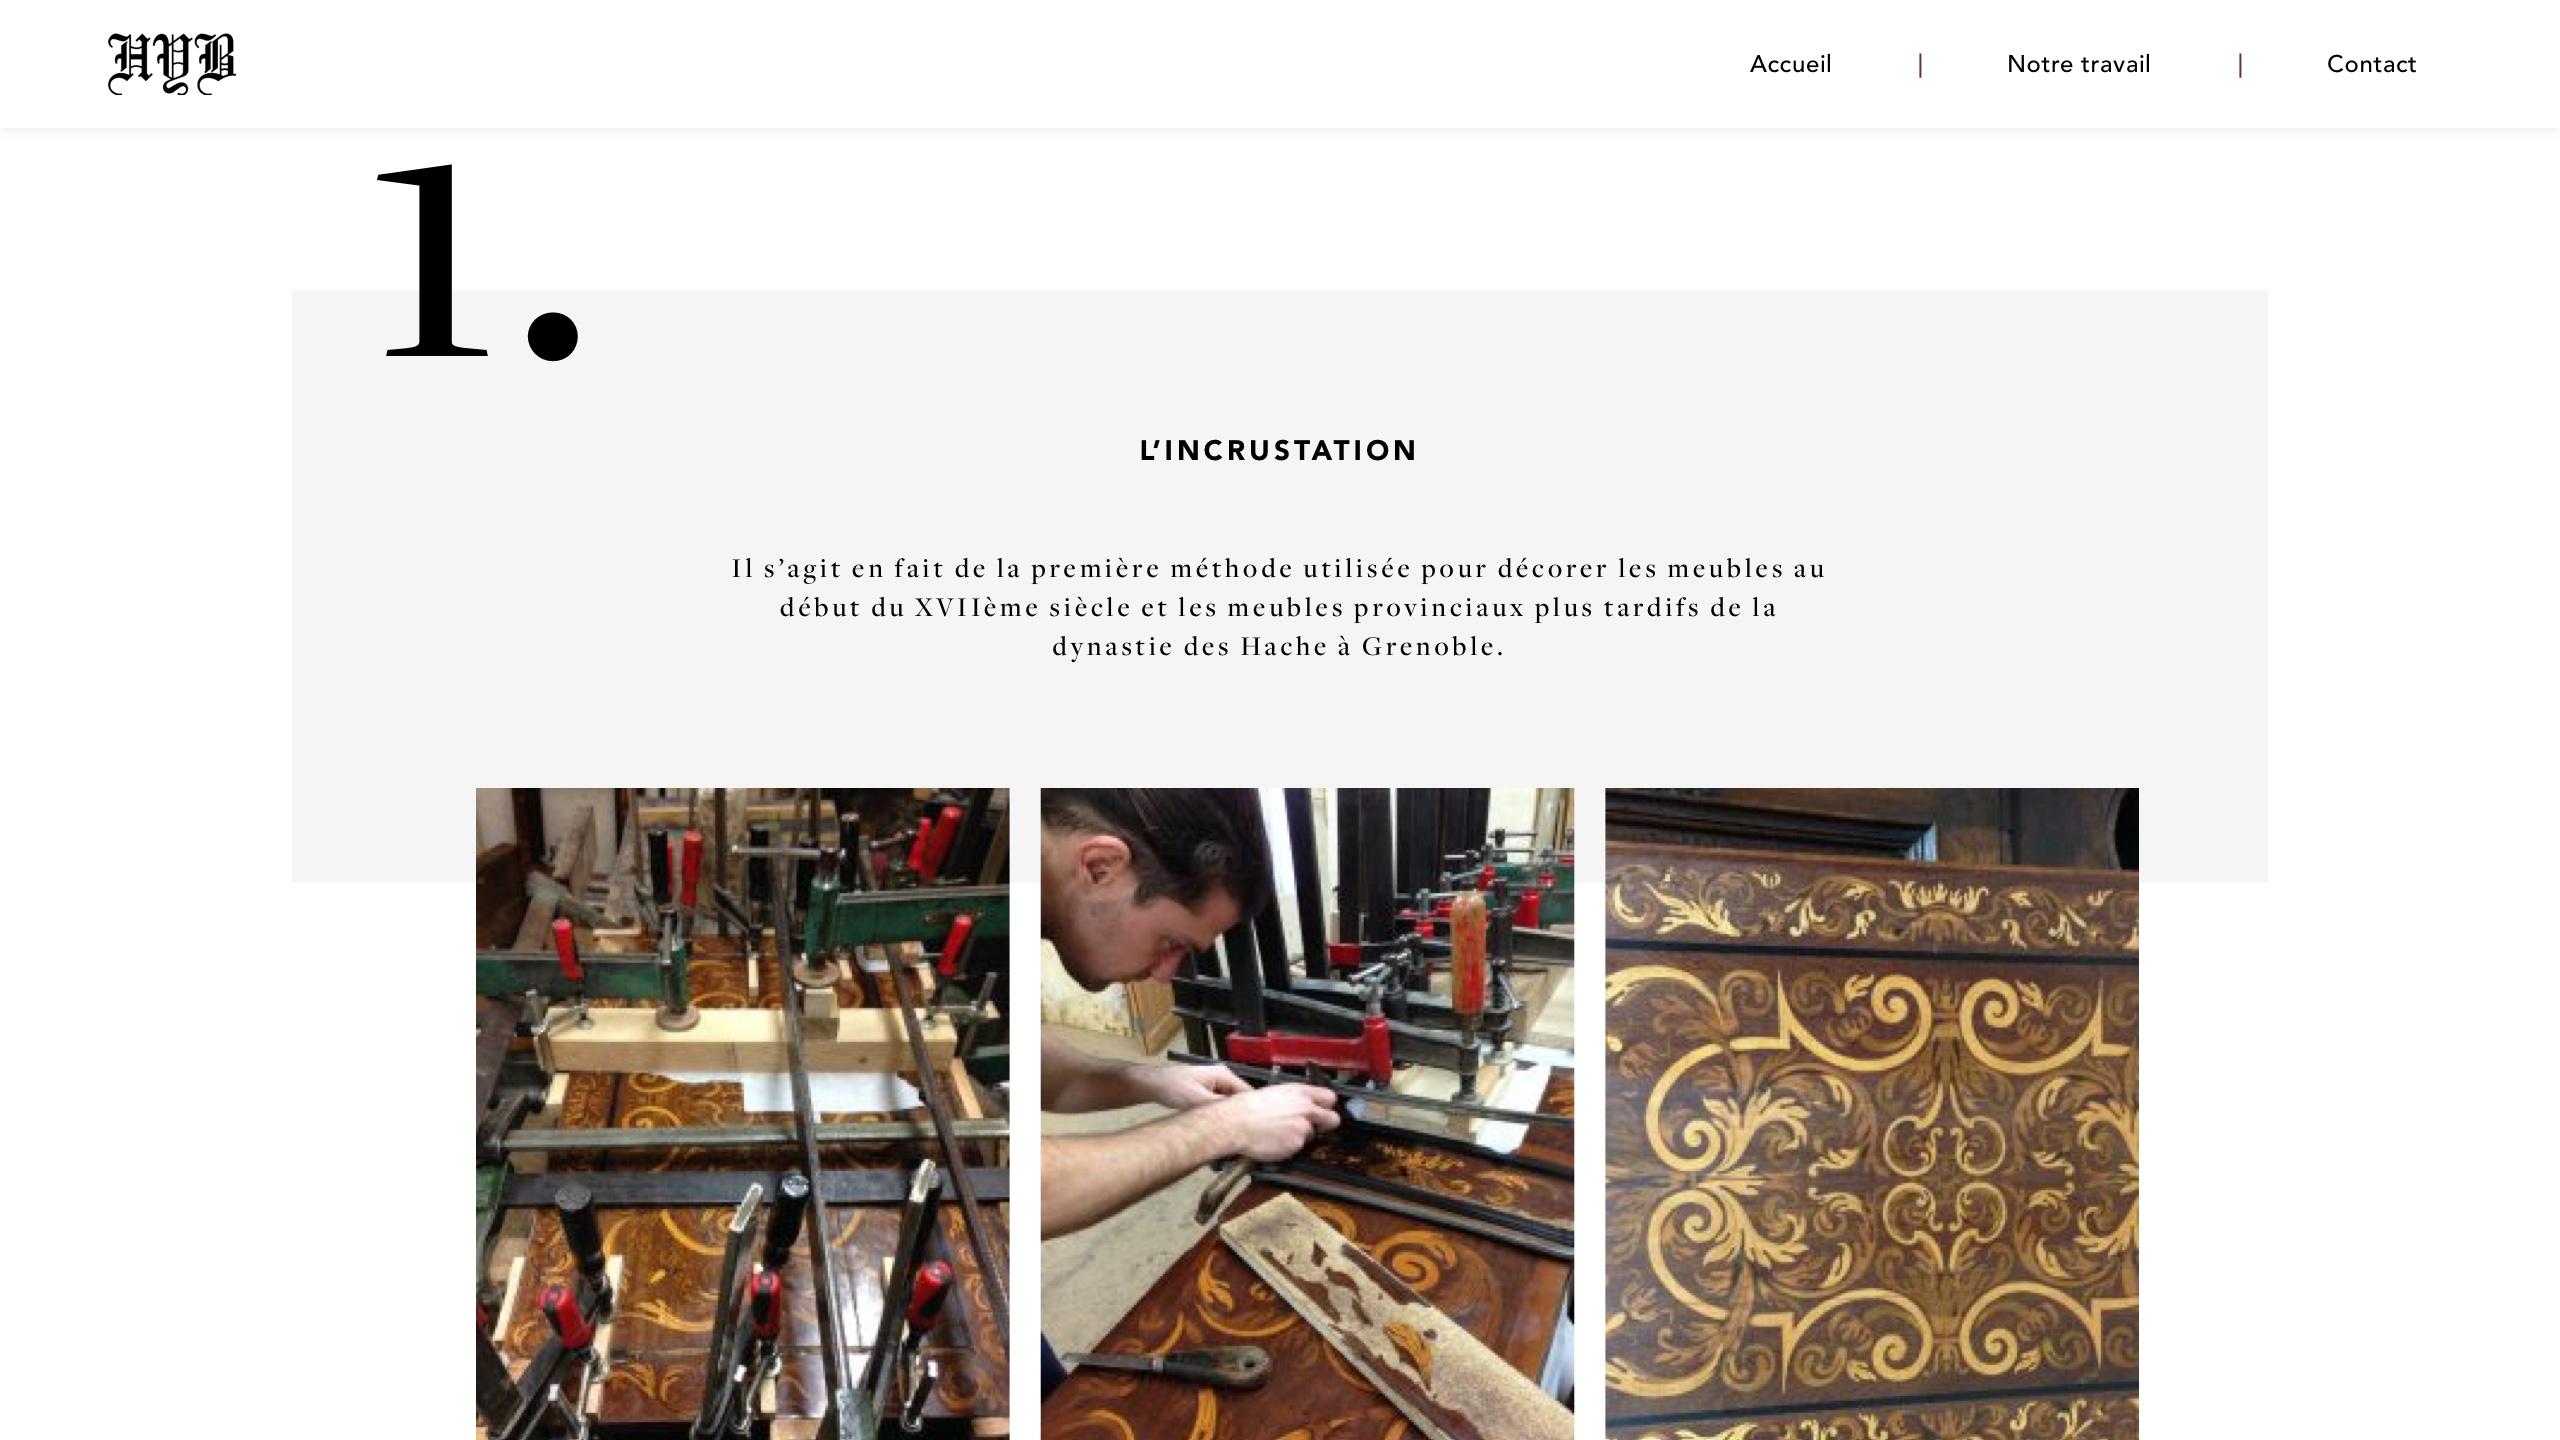 hostalery restauration meubles anciens le bois